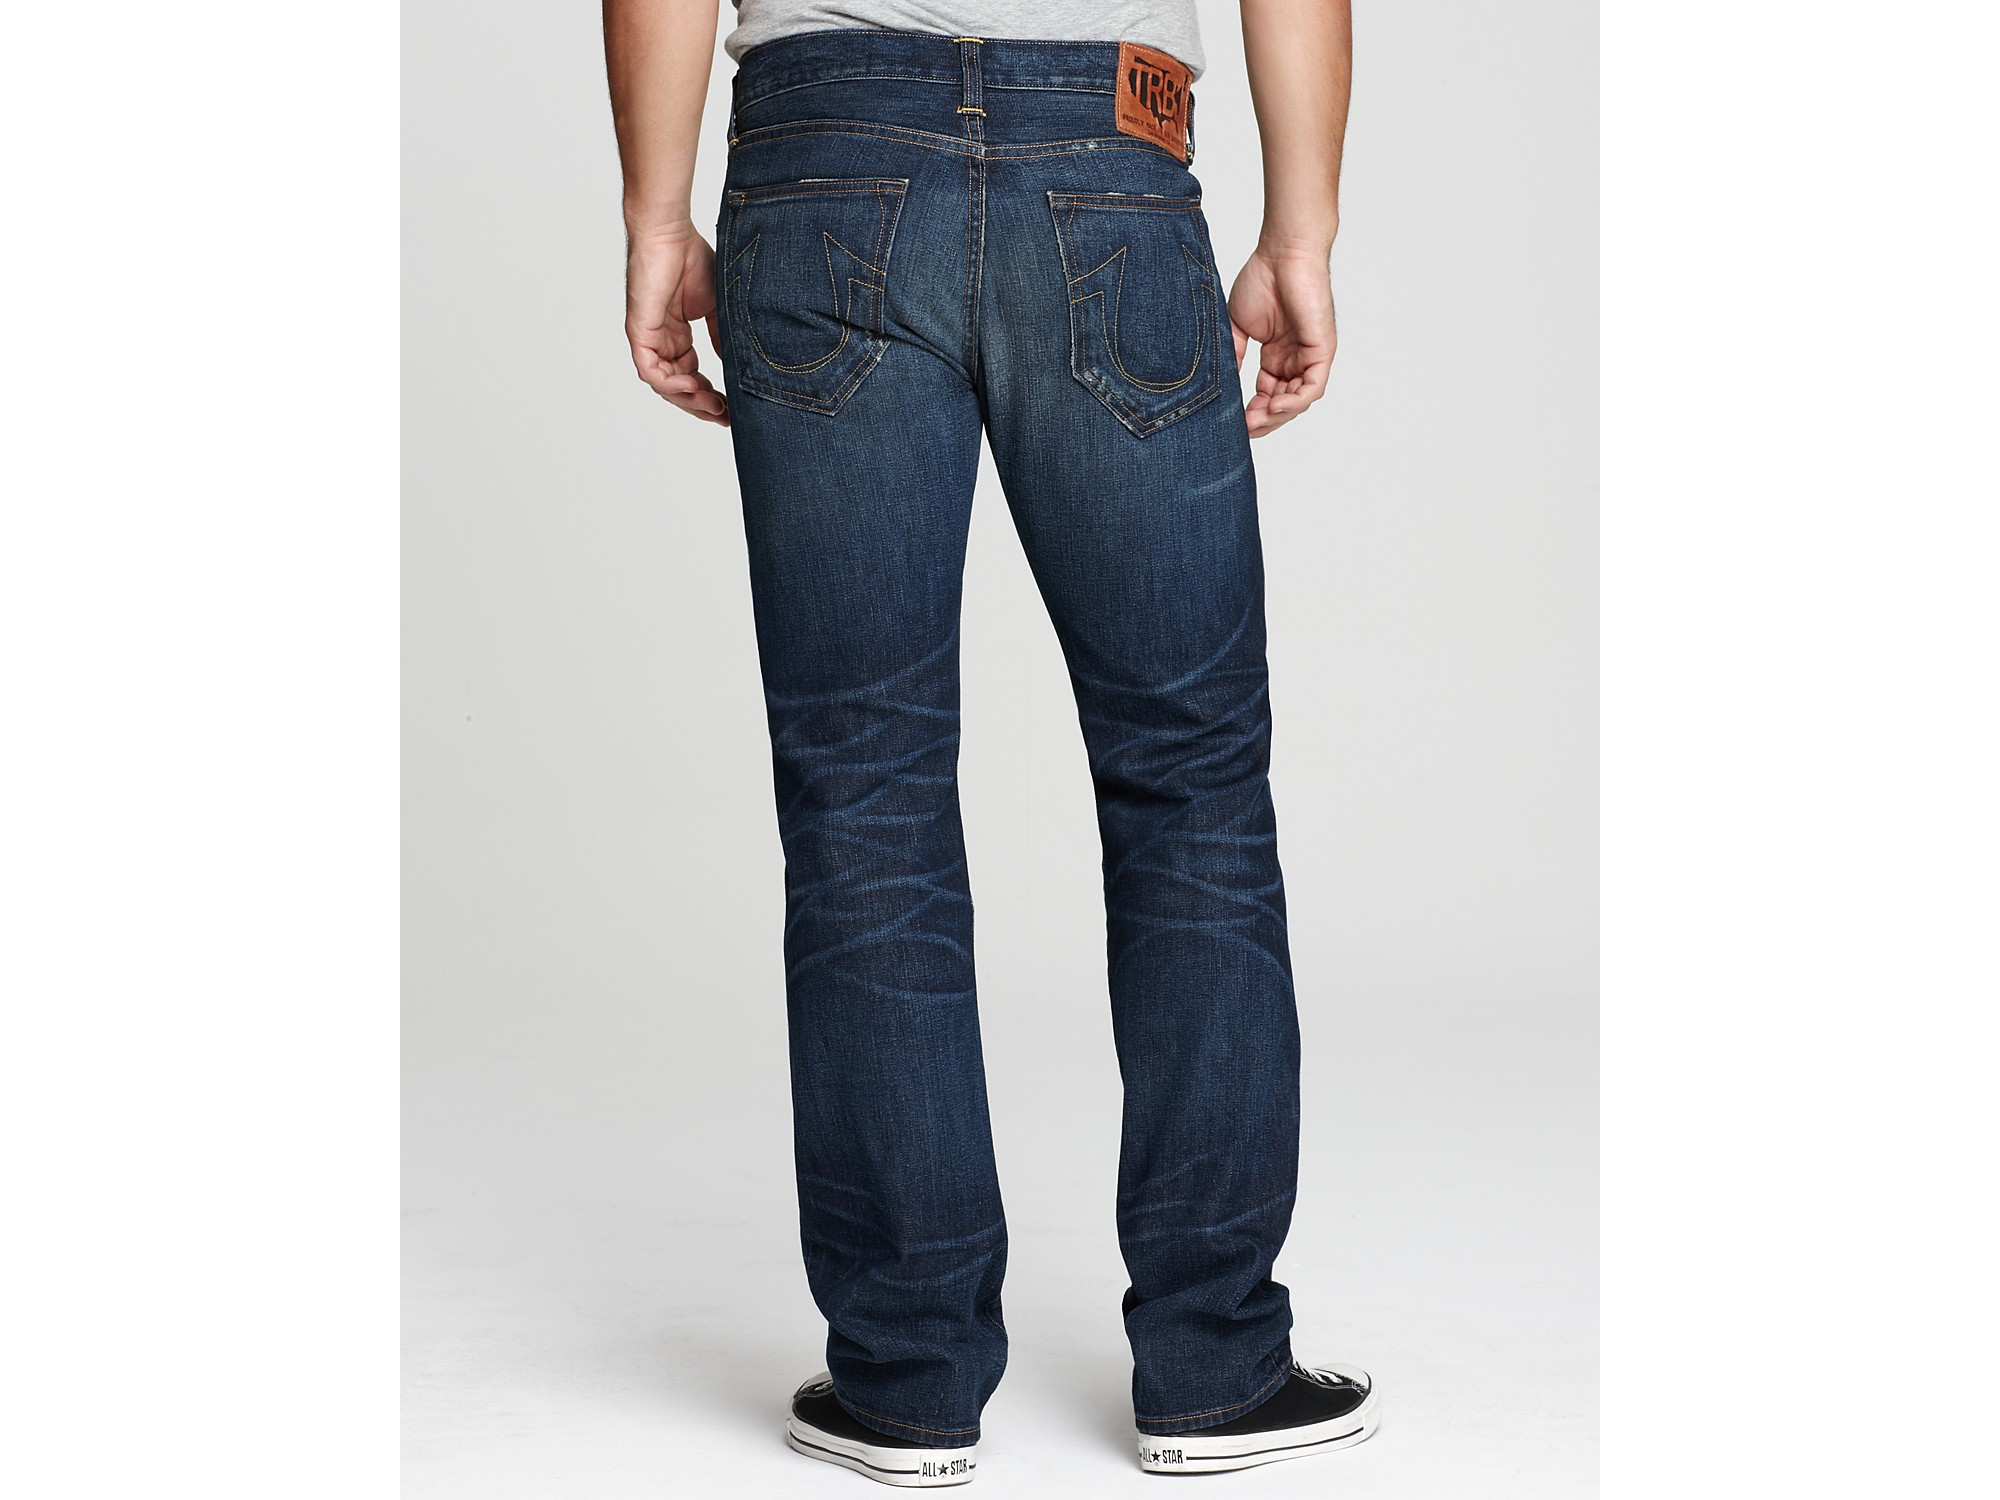 true religion bobby straight leg jeans in blue for men blue grass lyst. Black Bedroom Furniture Sets. Home Design Ideas